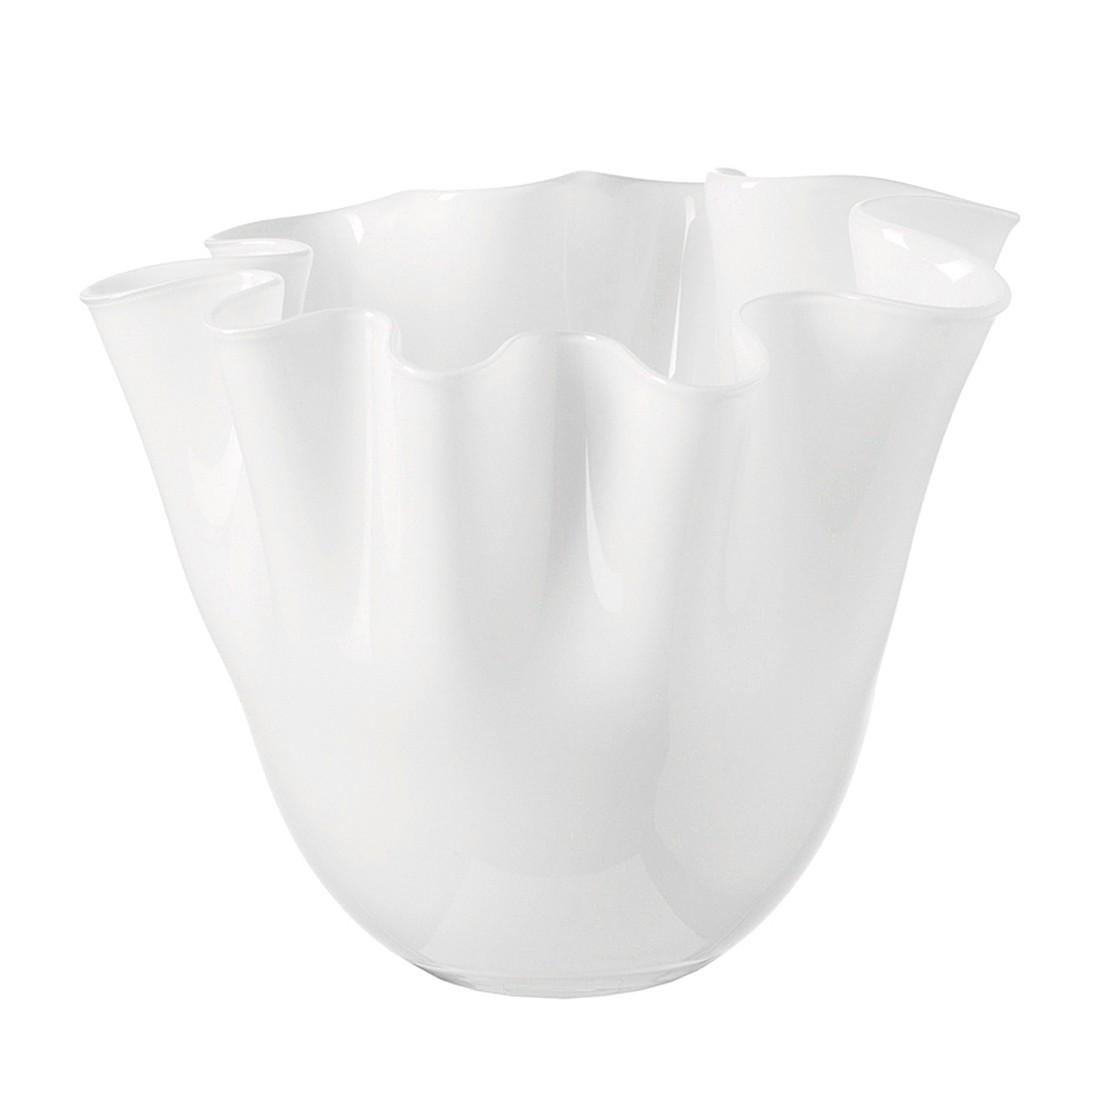 Vase Lia – 21 cm – Weiß, Leonardo kaufen